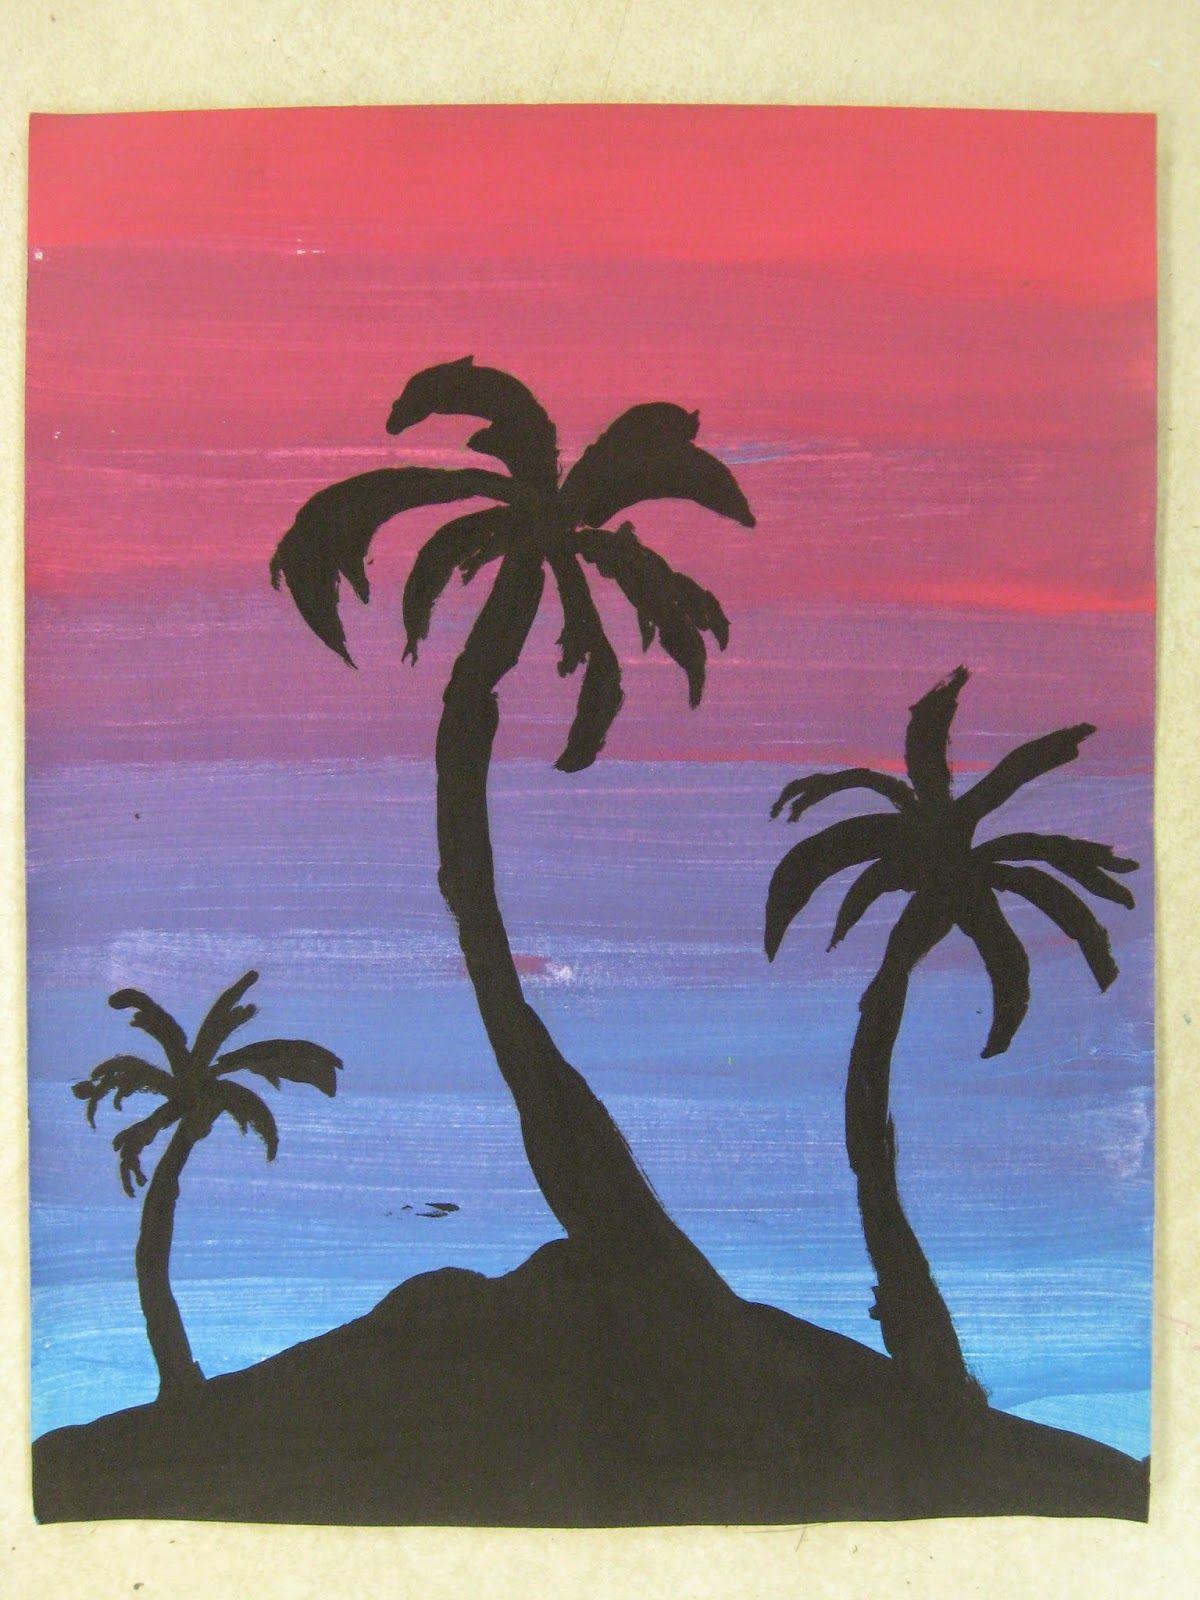 6th Grade Analogous Color Paintings Cizimler Sanat Pastel